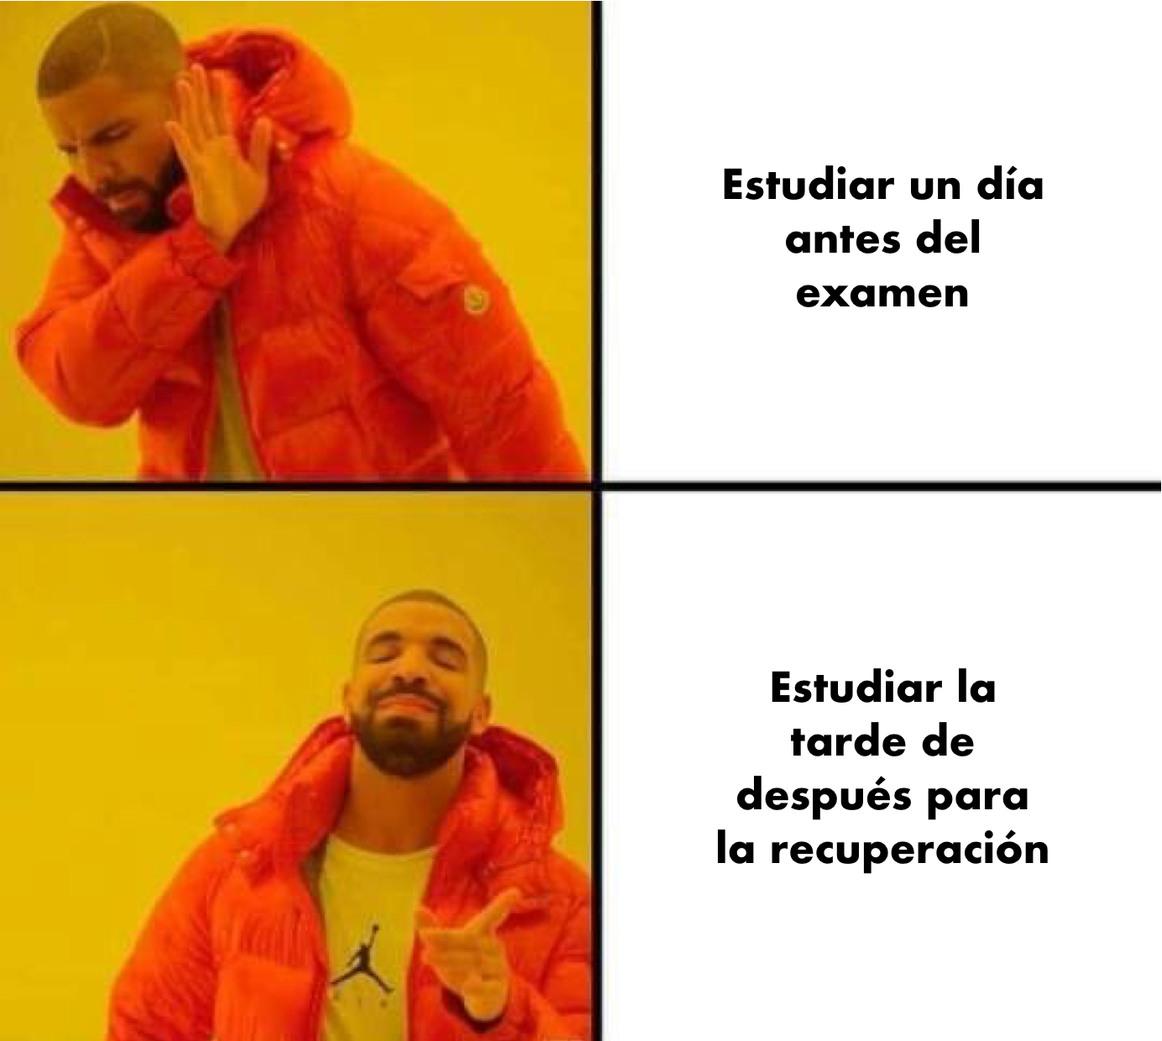 El Estudio - meme